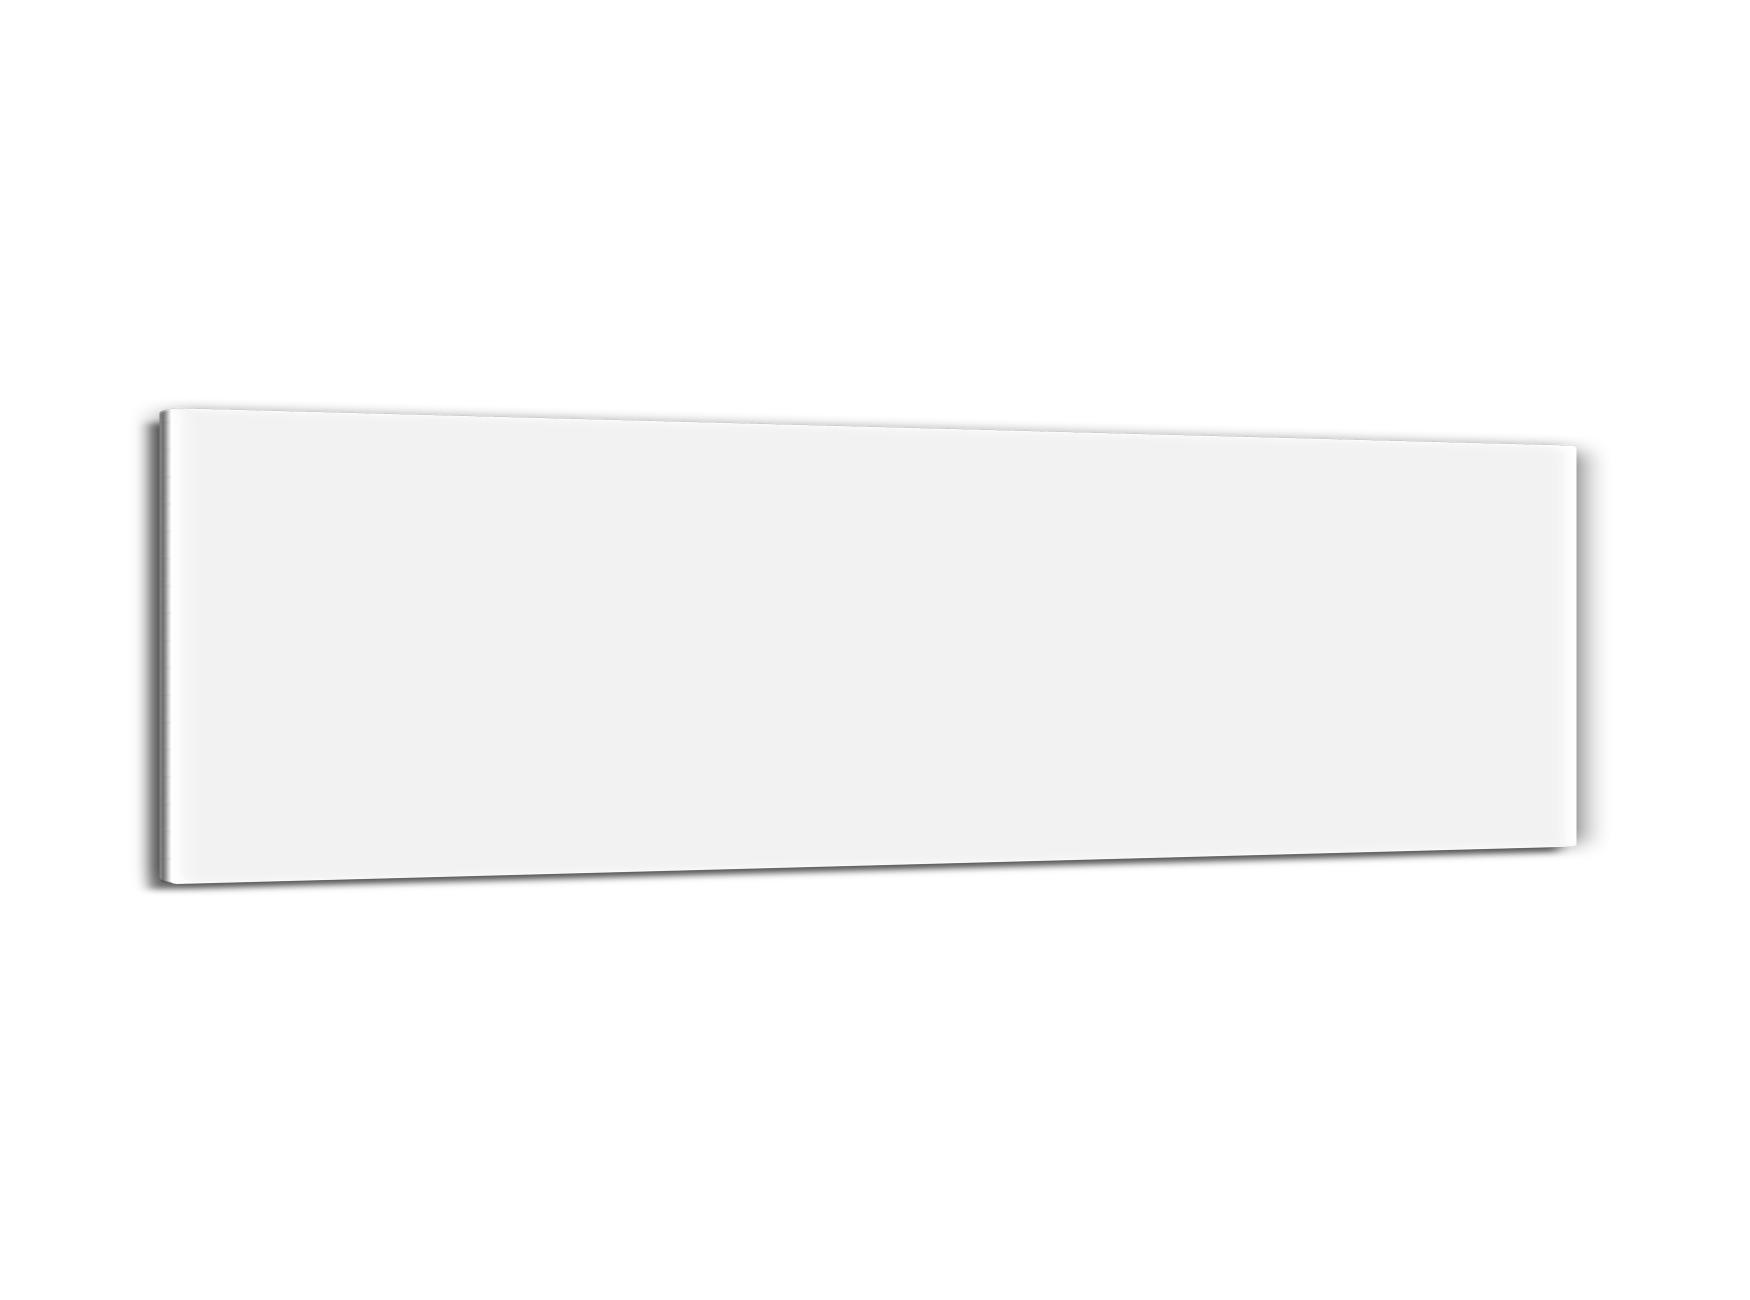 PowerSun Reflex, glatt, Knebel infrarotheizungen